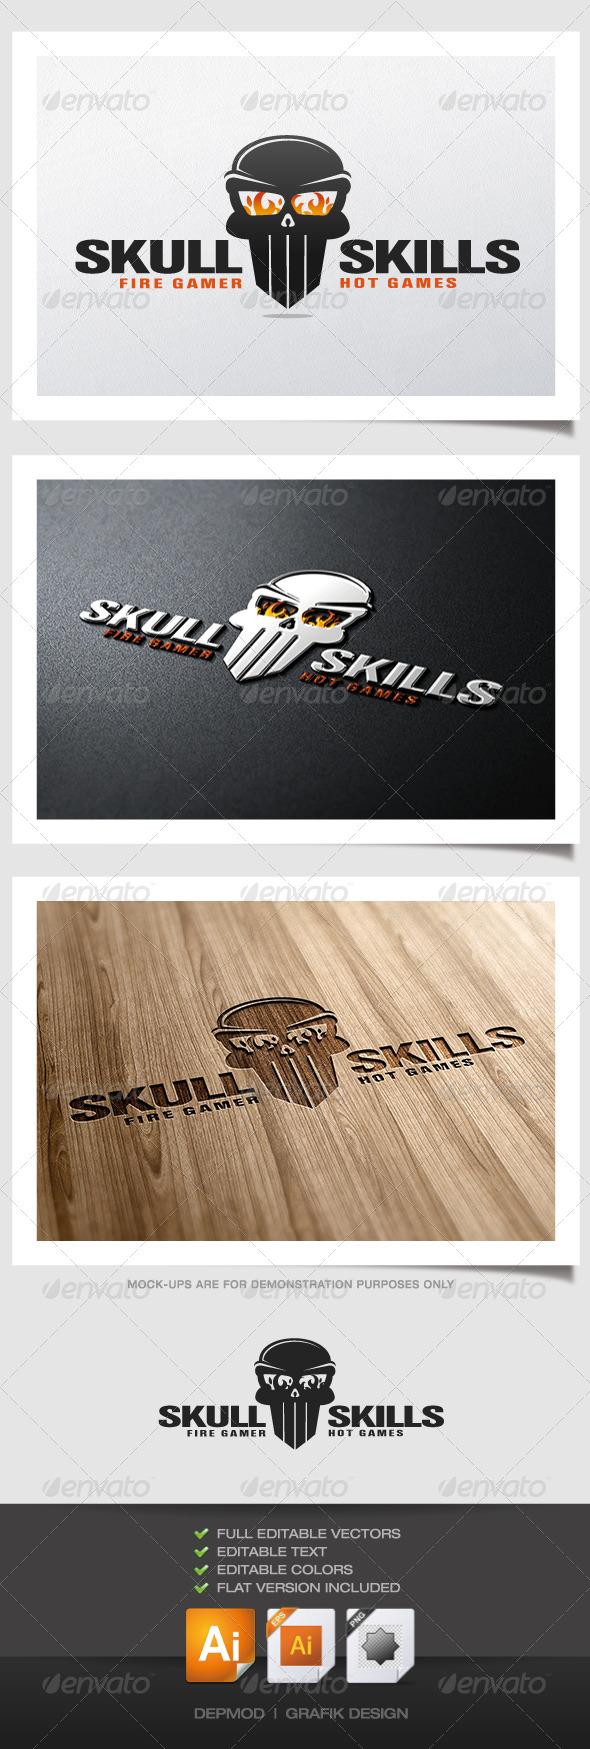 GraphicRiver Skull Skills Logo 4744615